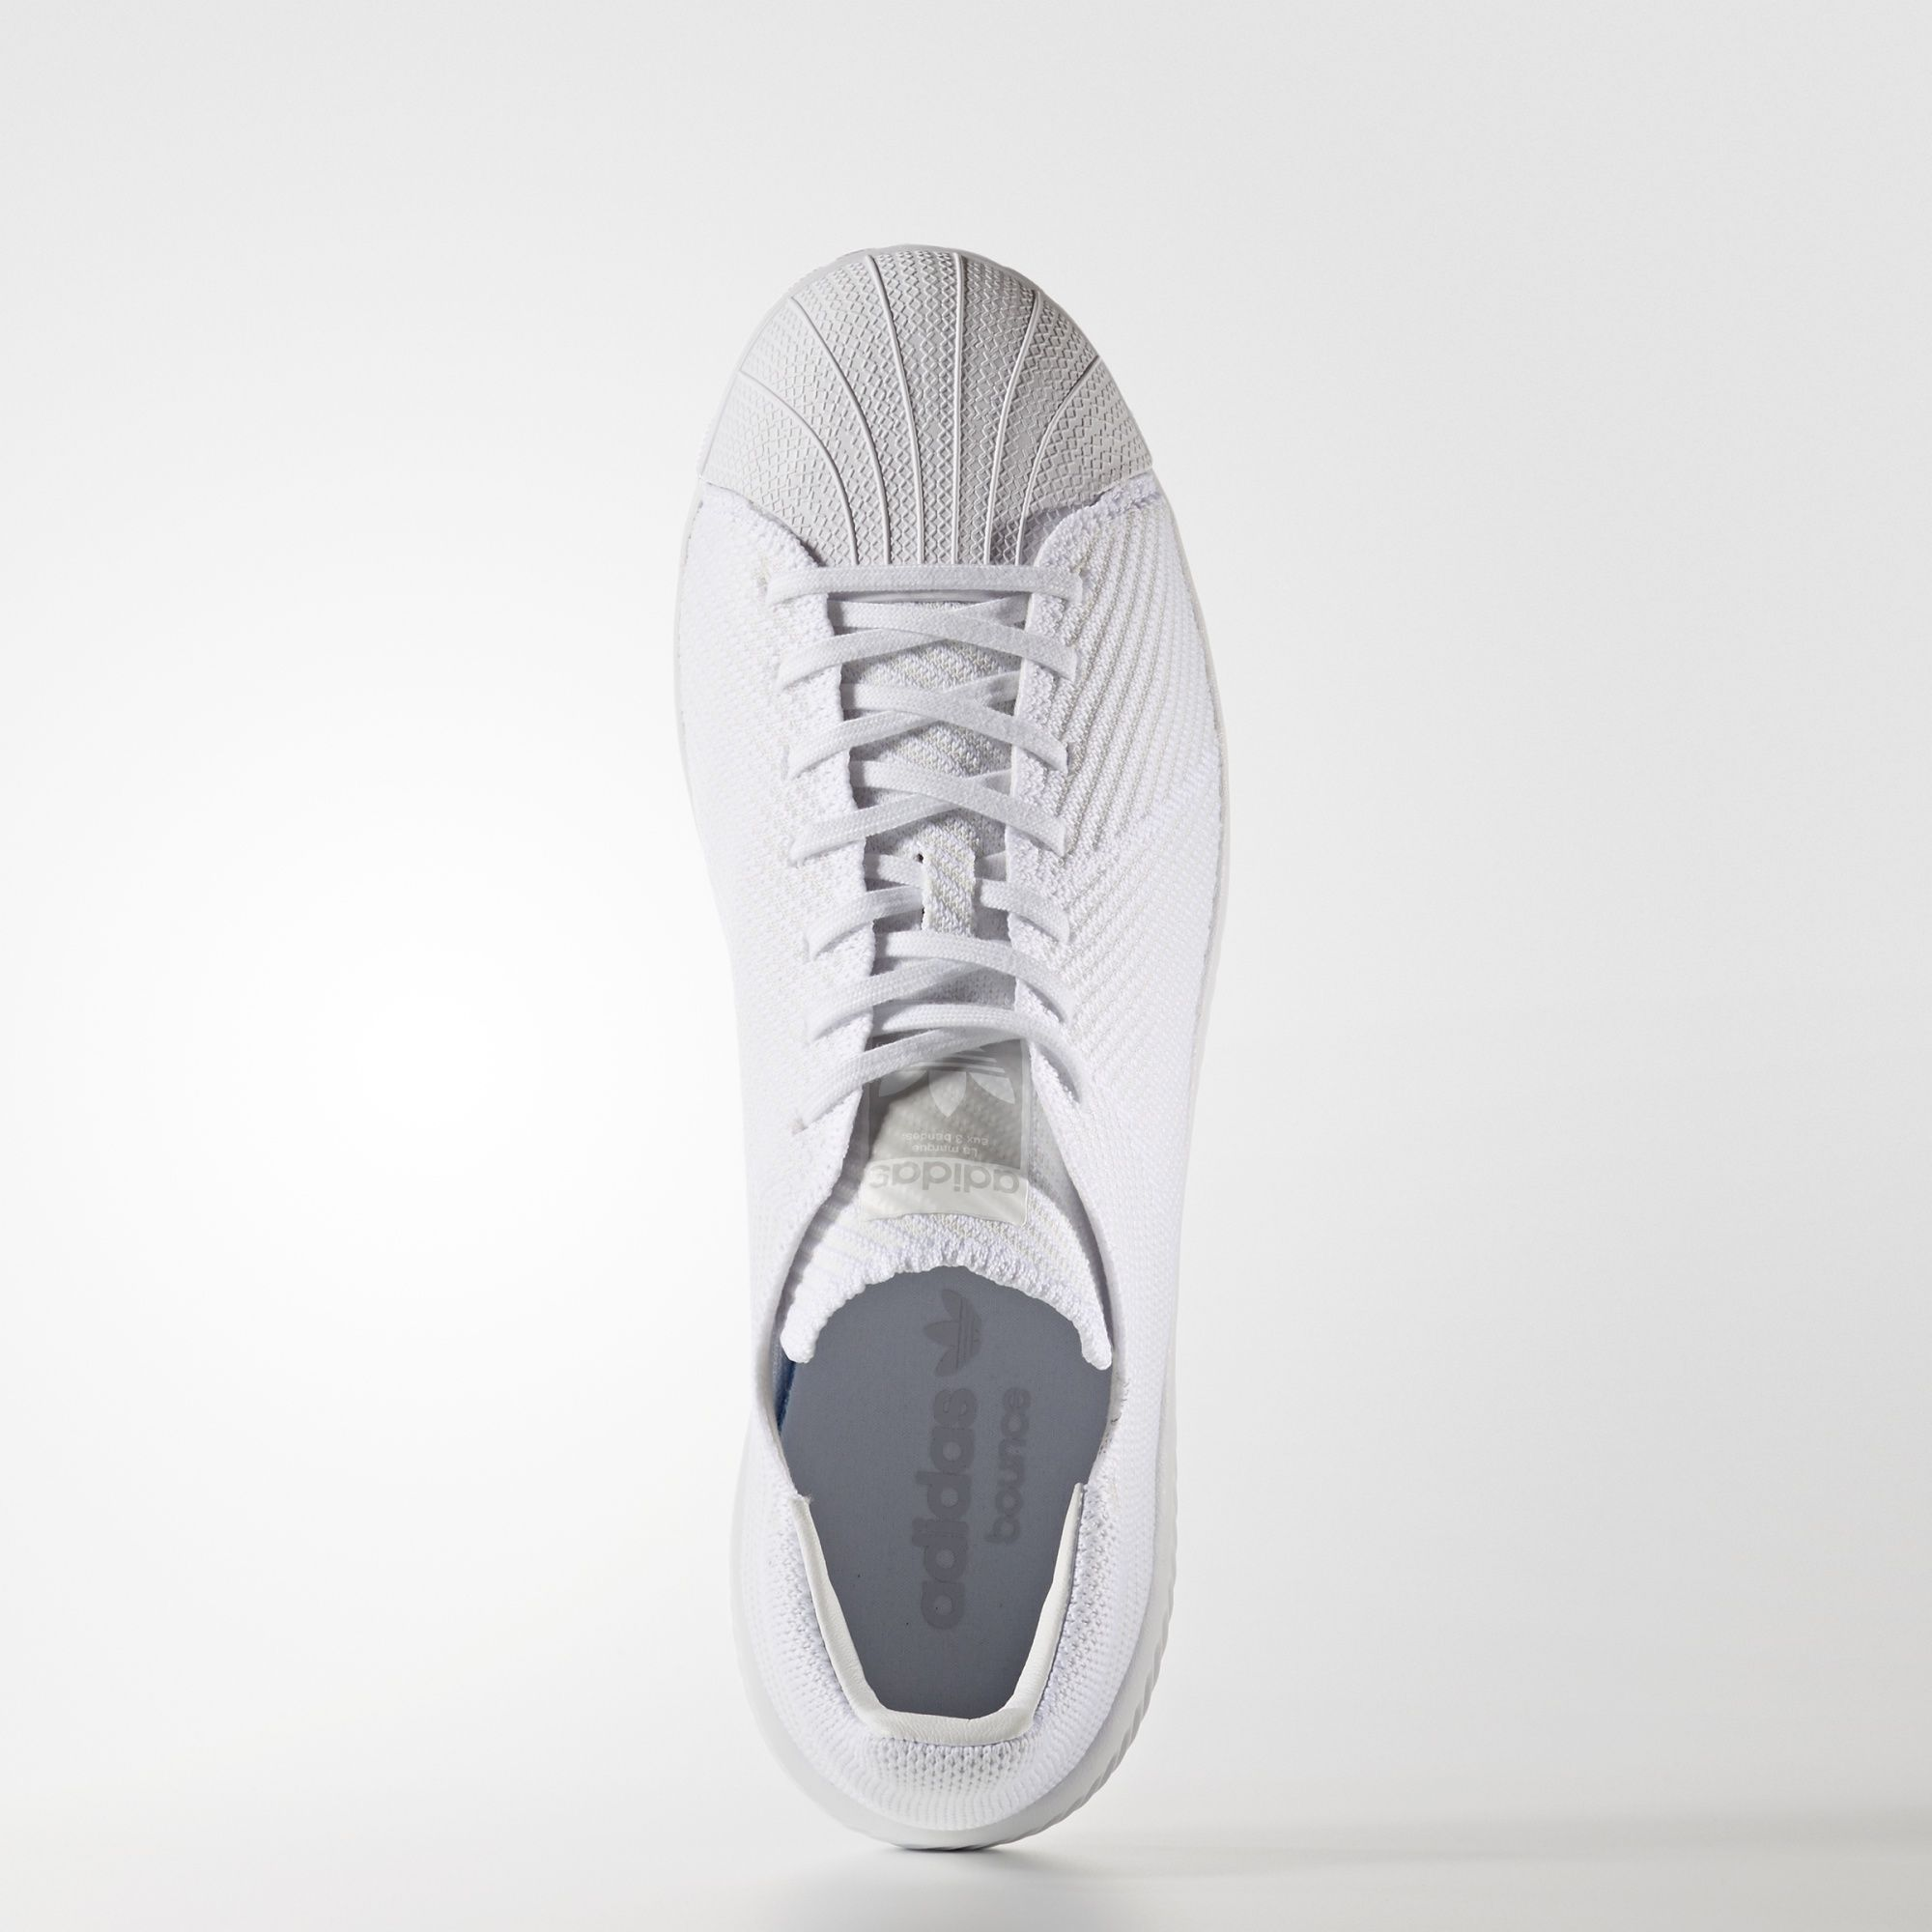 Adidas Superstar Rebote Primeknit Blanco 2aNstULc